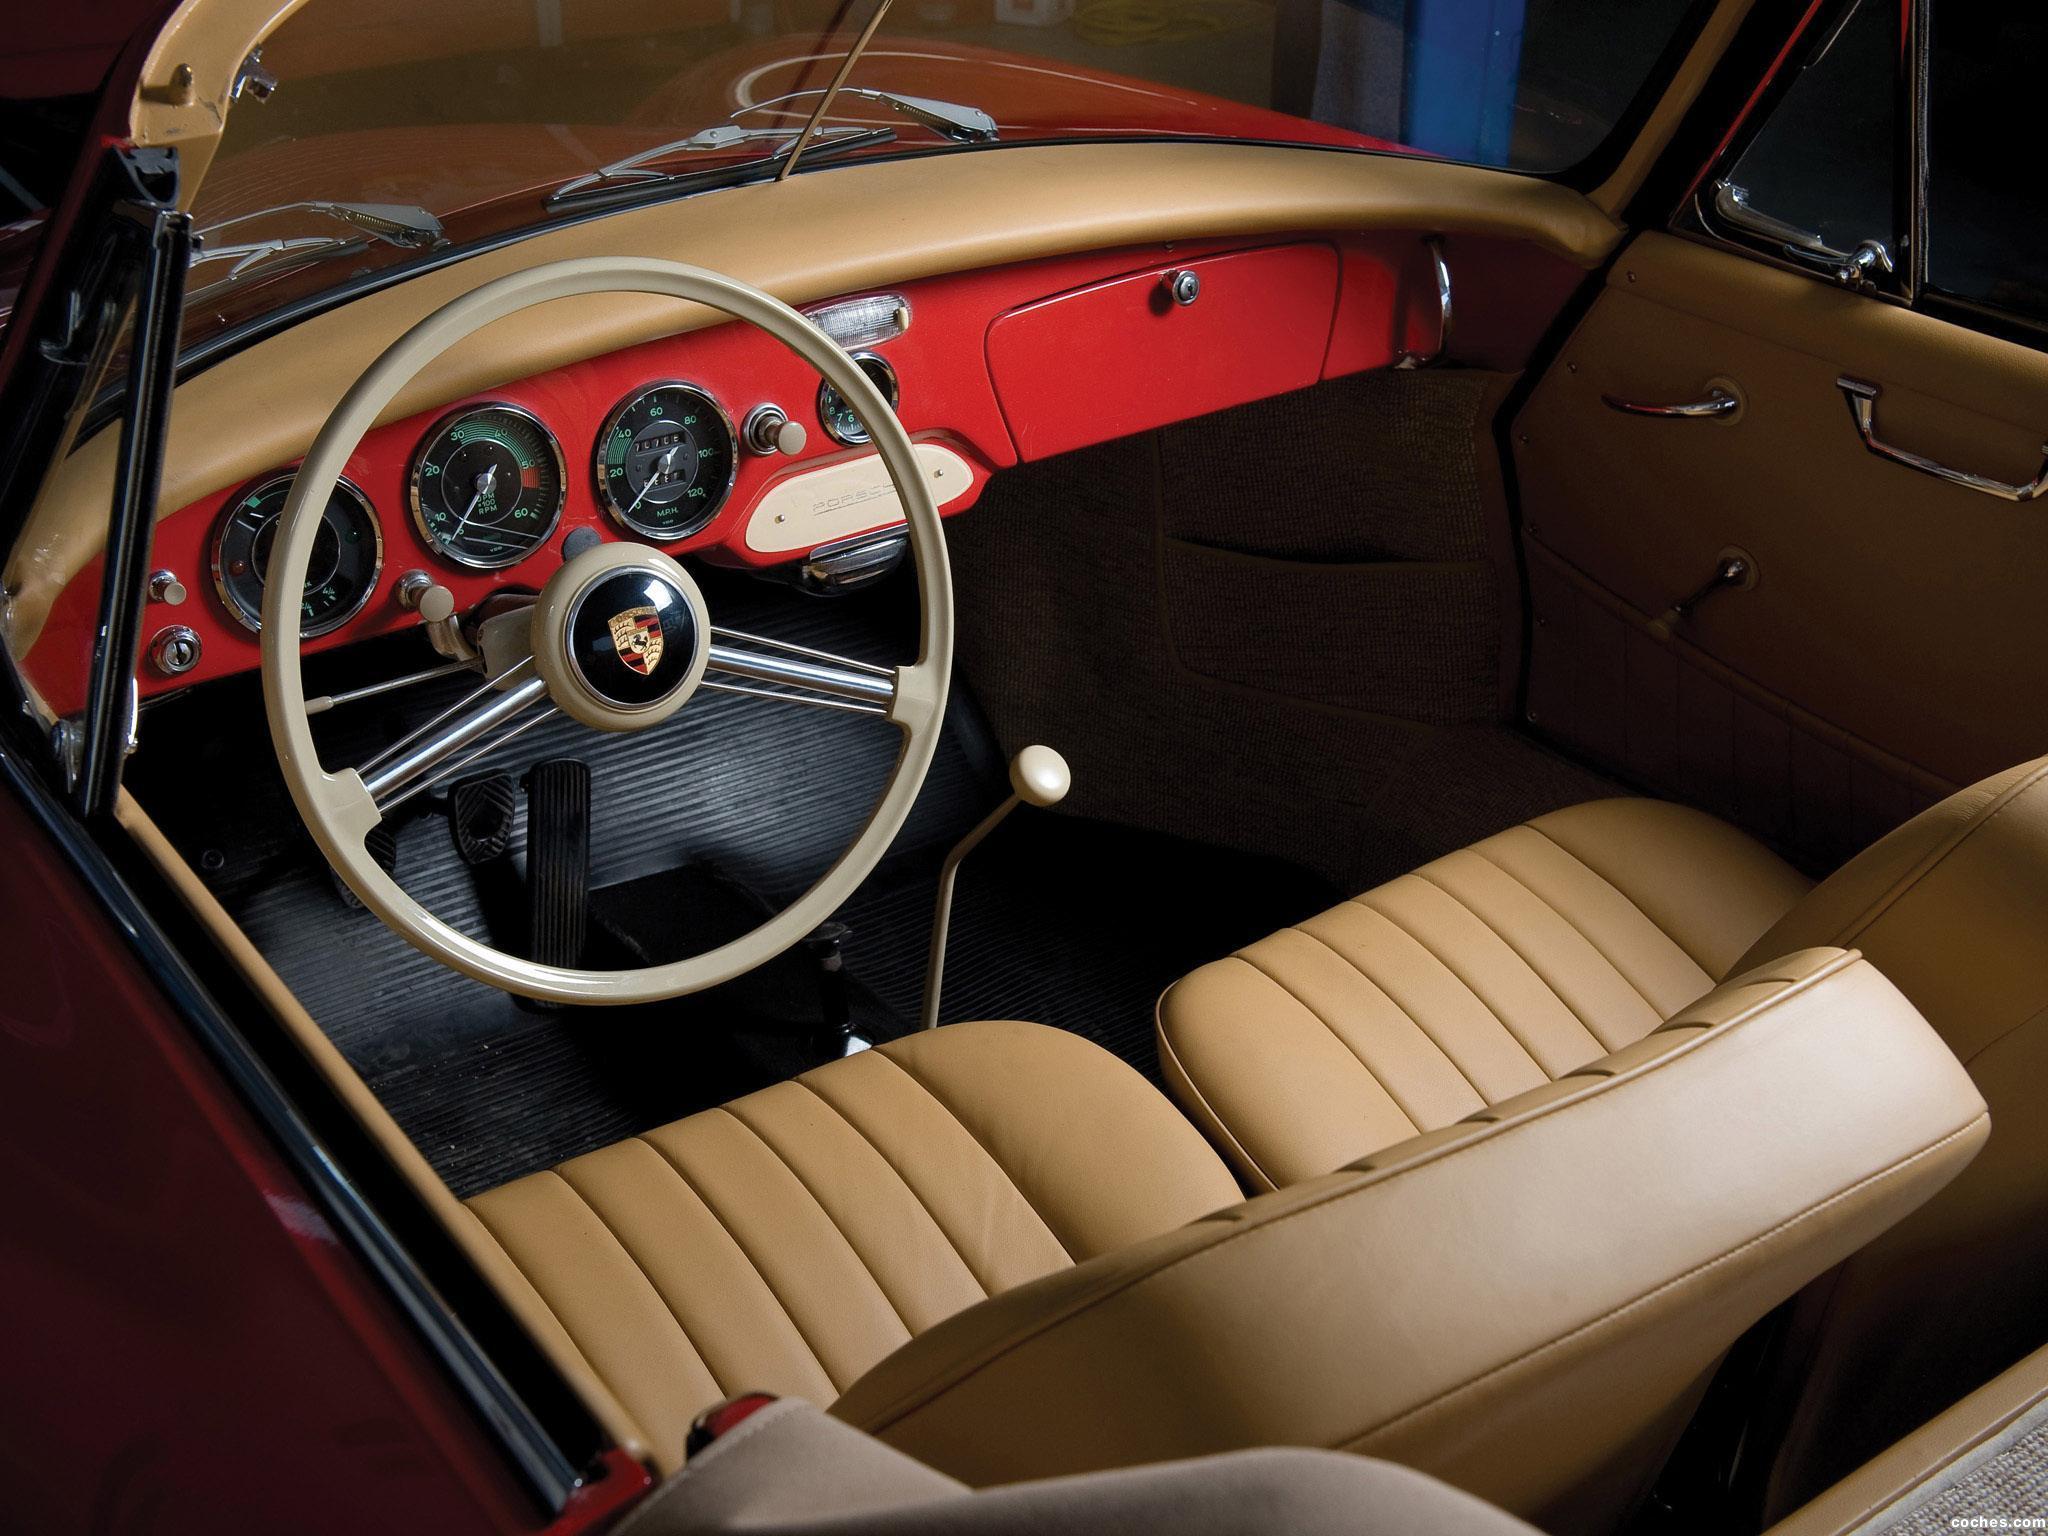 Foto 3 de Porsche 356 A Cabriolet 1955